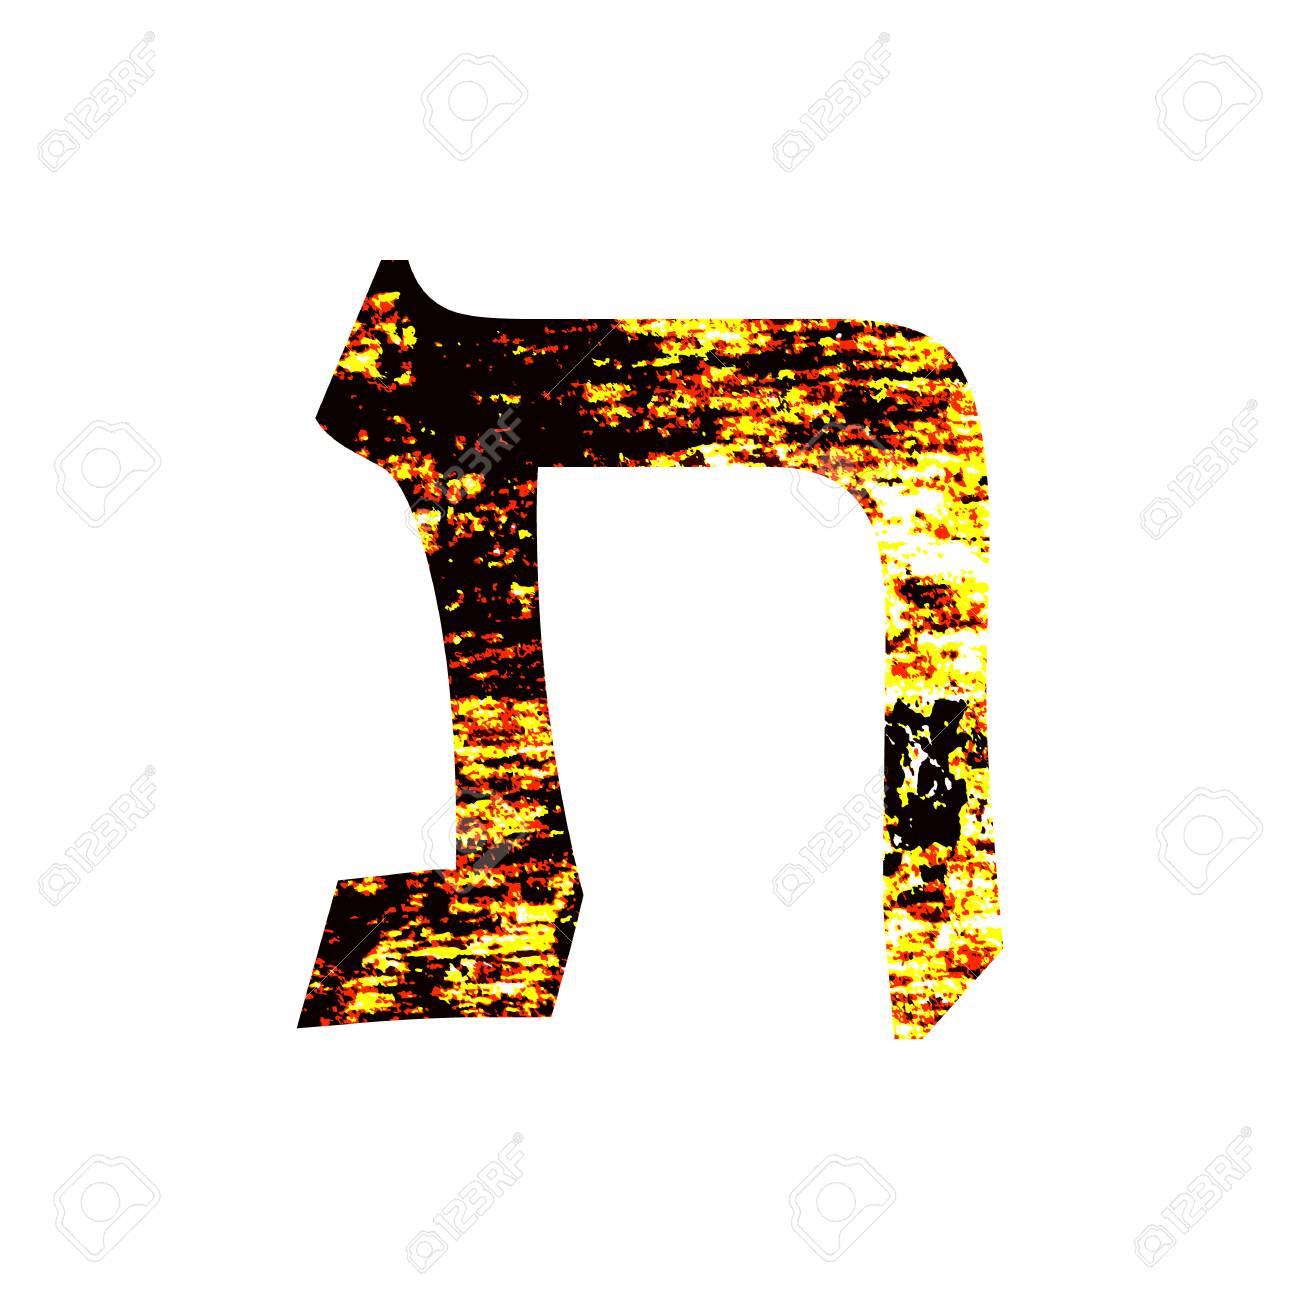 Lettre Hébraïque Tav. Polices D'or Minable. L'alphabet Hébreu ...